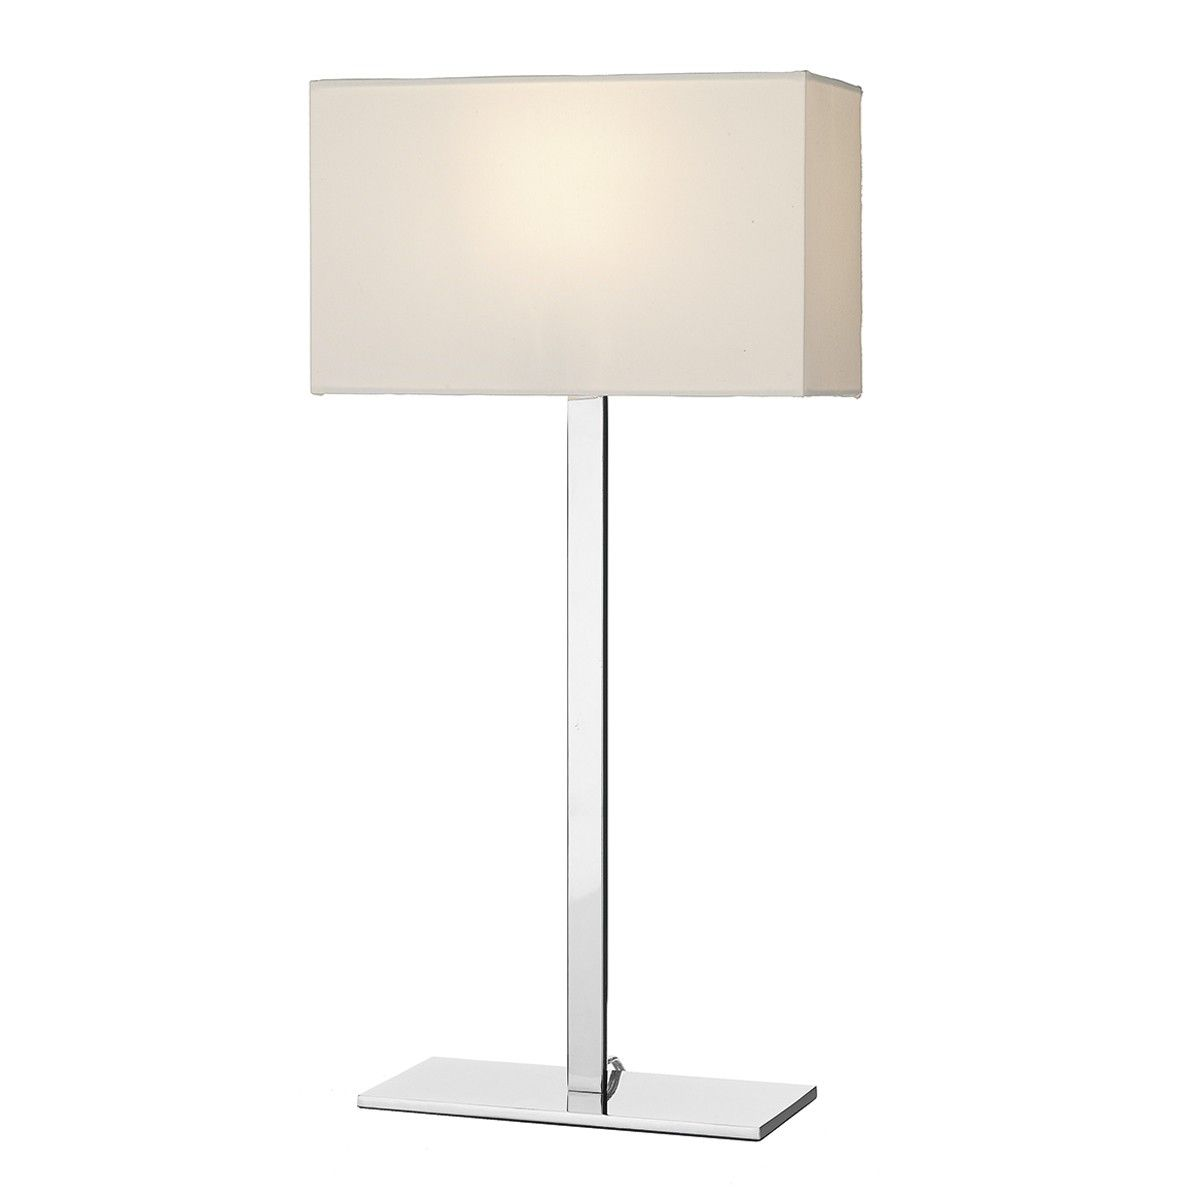 Dar lighting tri4250 trieste table lamp polished chrome base dar lighting tri4250 trieste table lamp polished chrome base only aloadofball Images